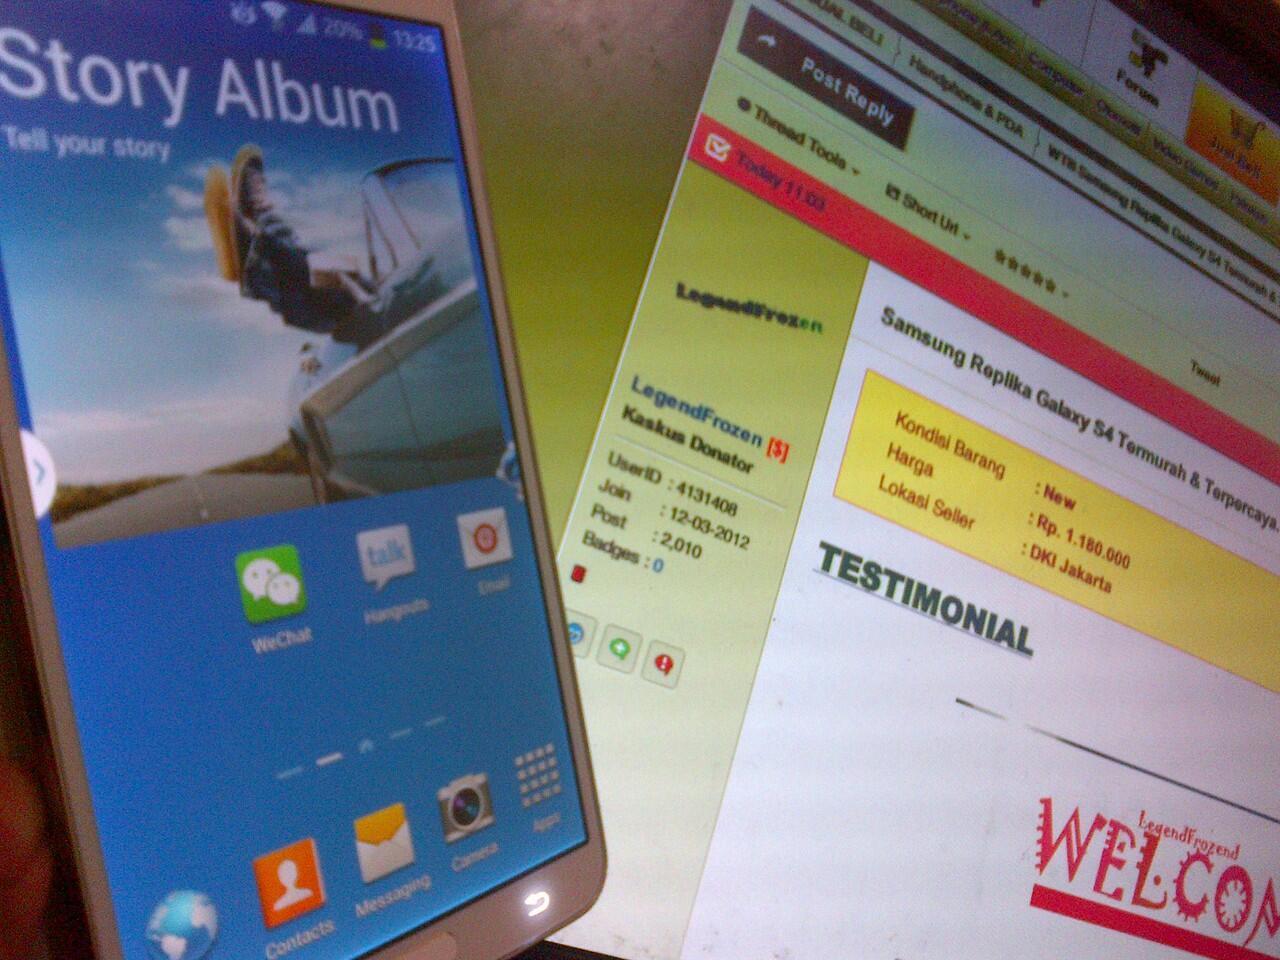 Samsung Replika Galaxy S4 Termurah & Terpercaya.